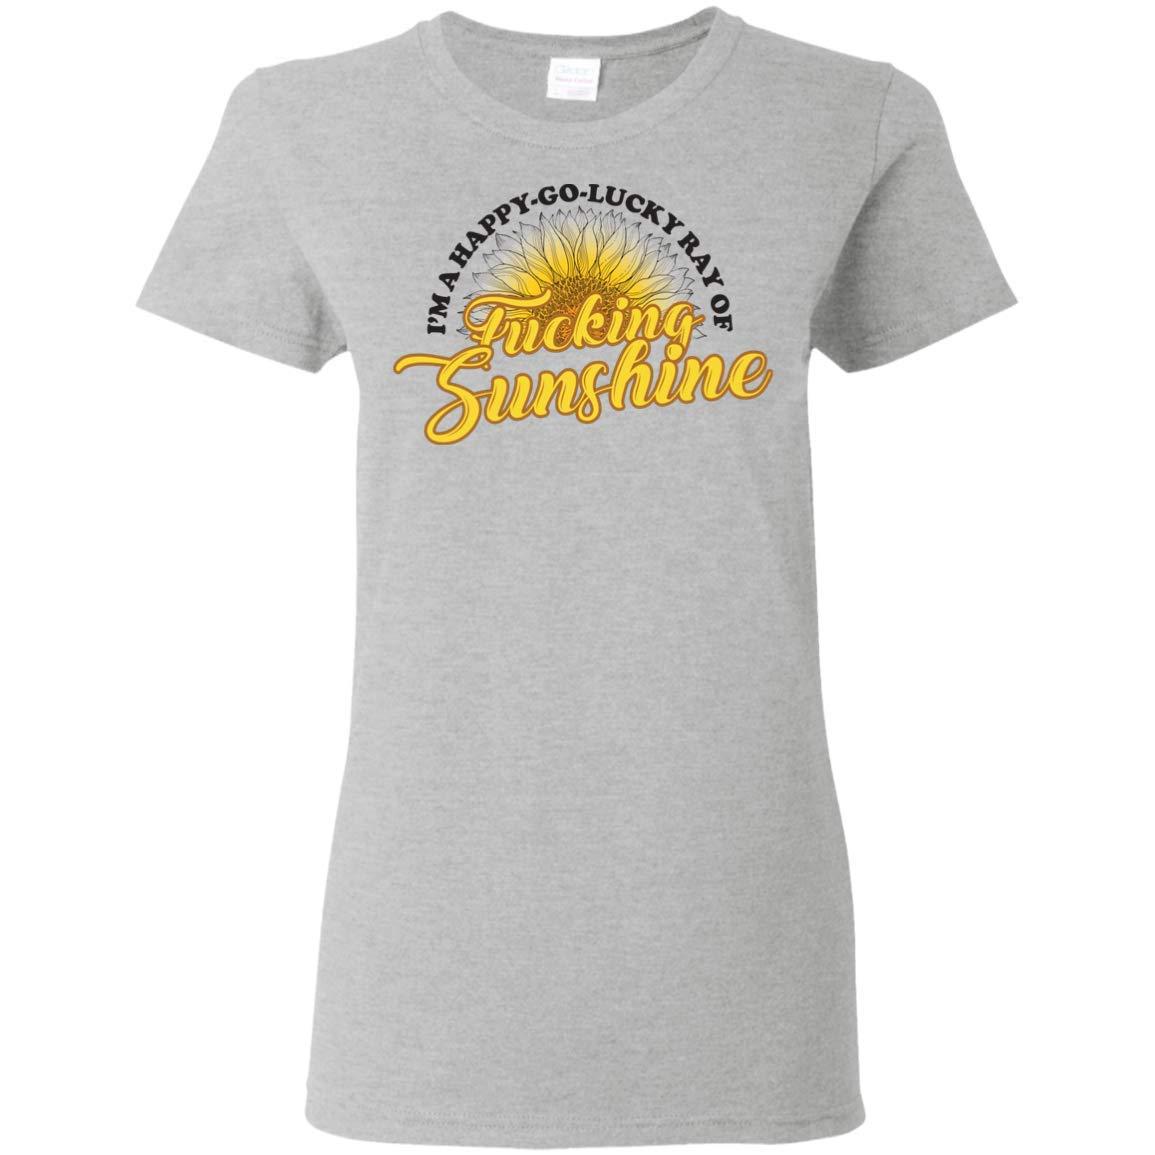 Pixhe Im A Happy Go Lucky Ray Of Fucking Sunshine Tshirt